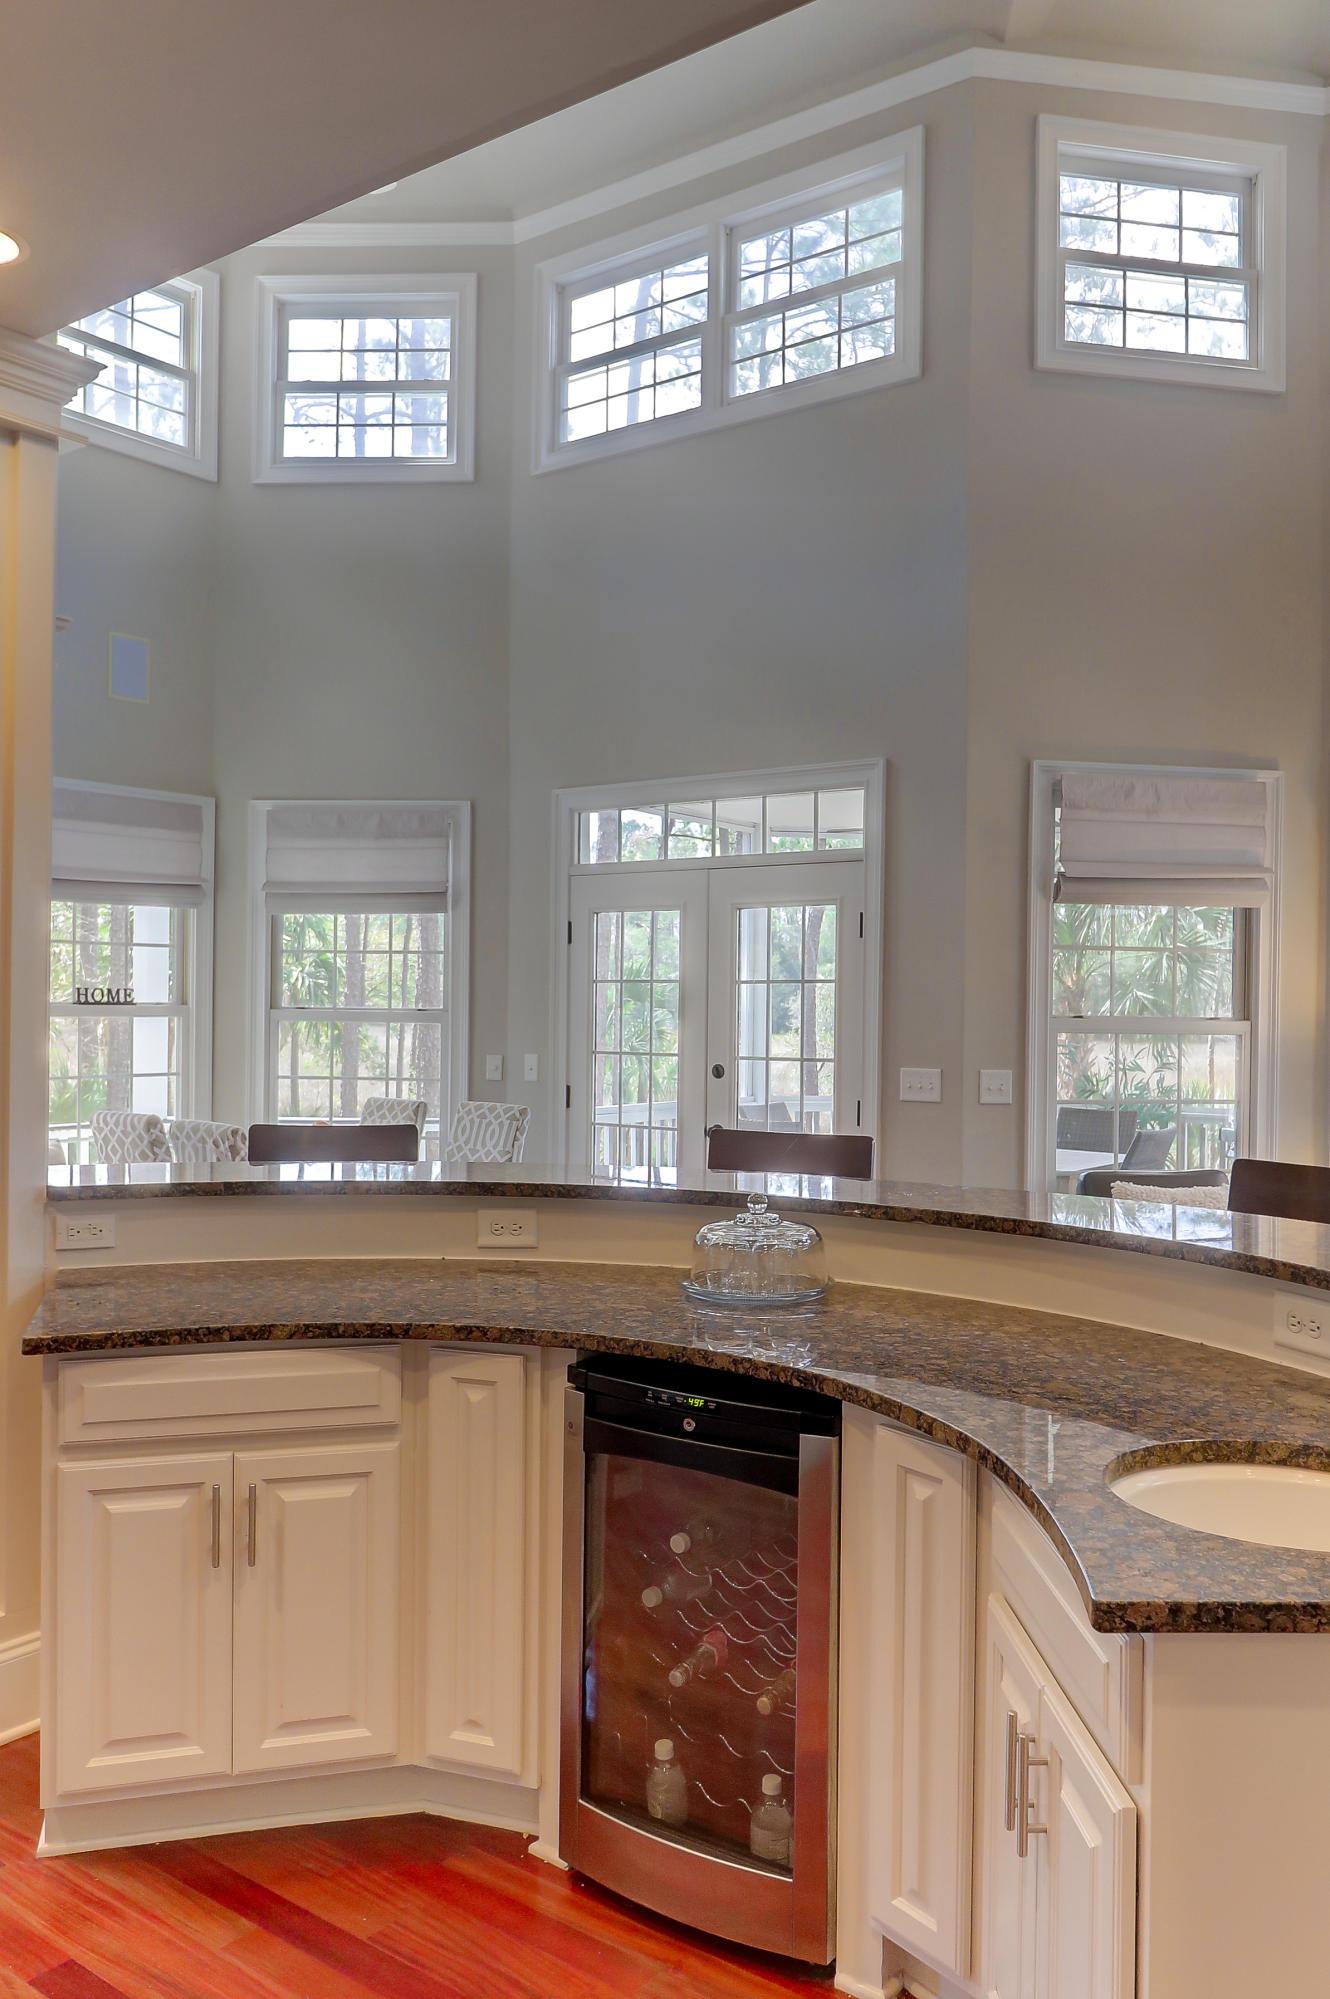 Dunes West Homes For Sale - 2996 Pignatelli Crescent, Mount Pleasant, SC - 116